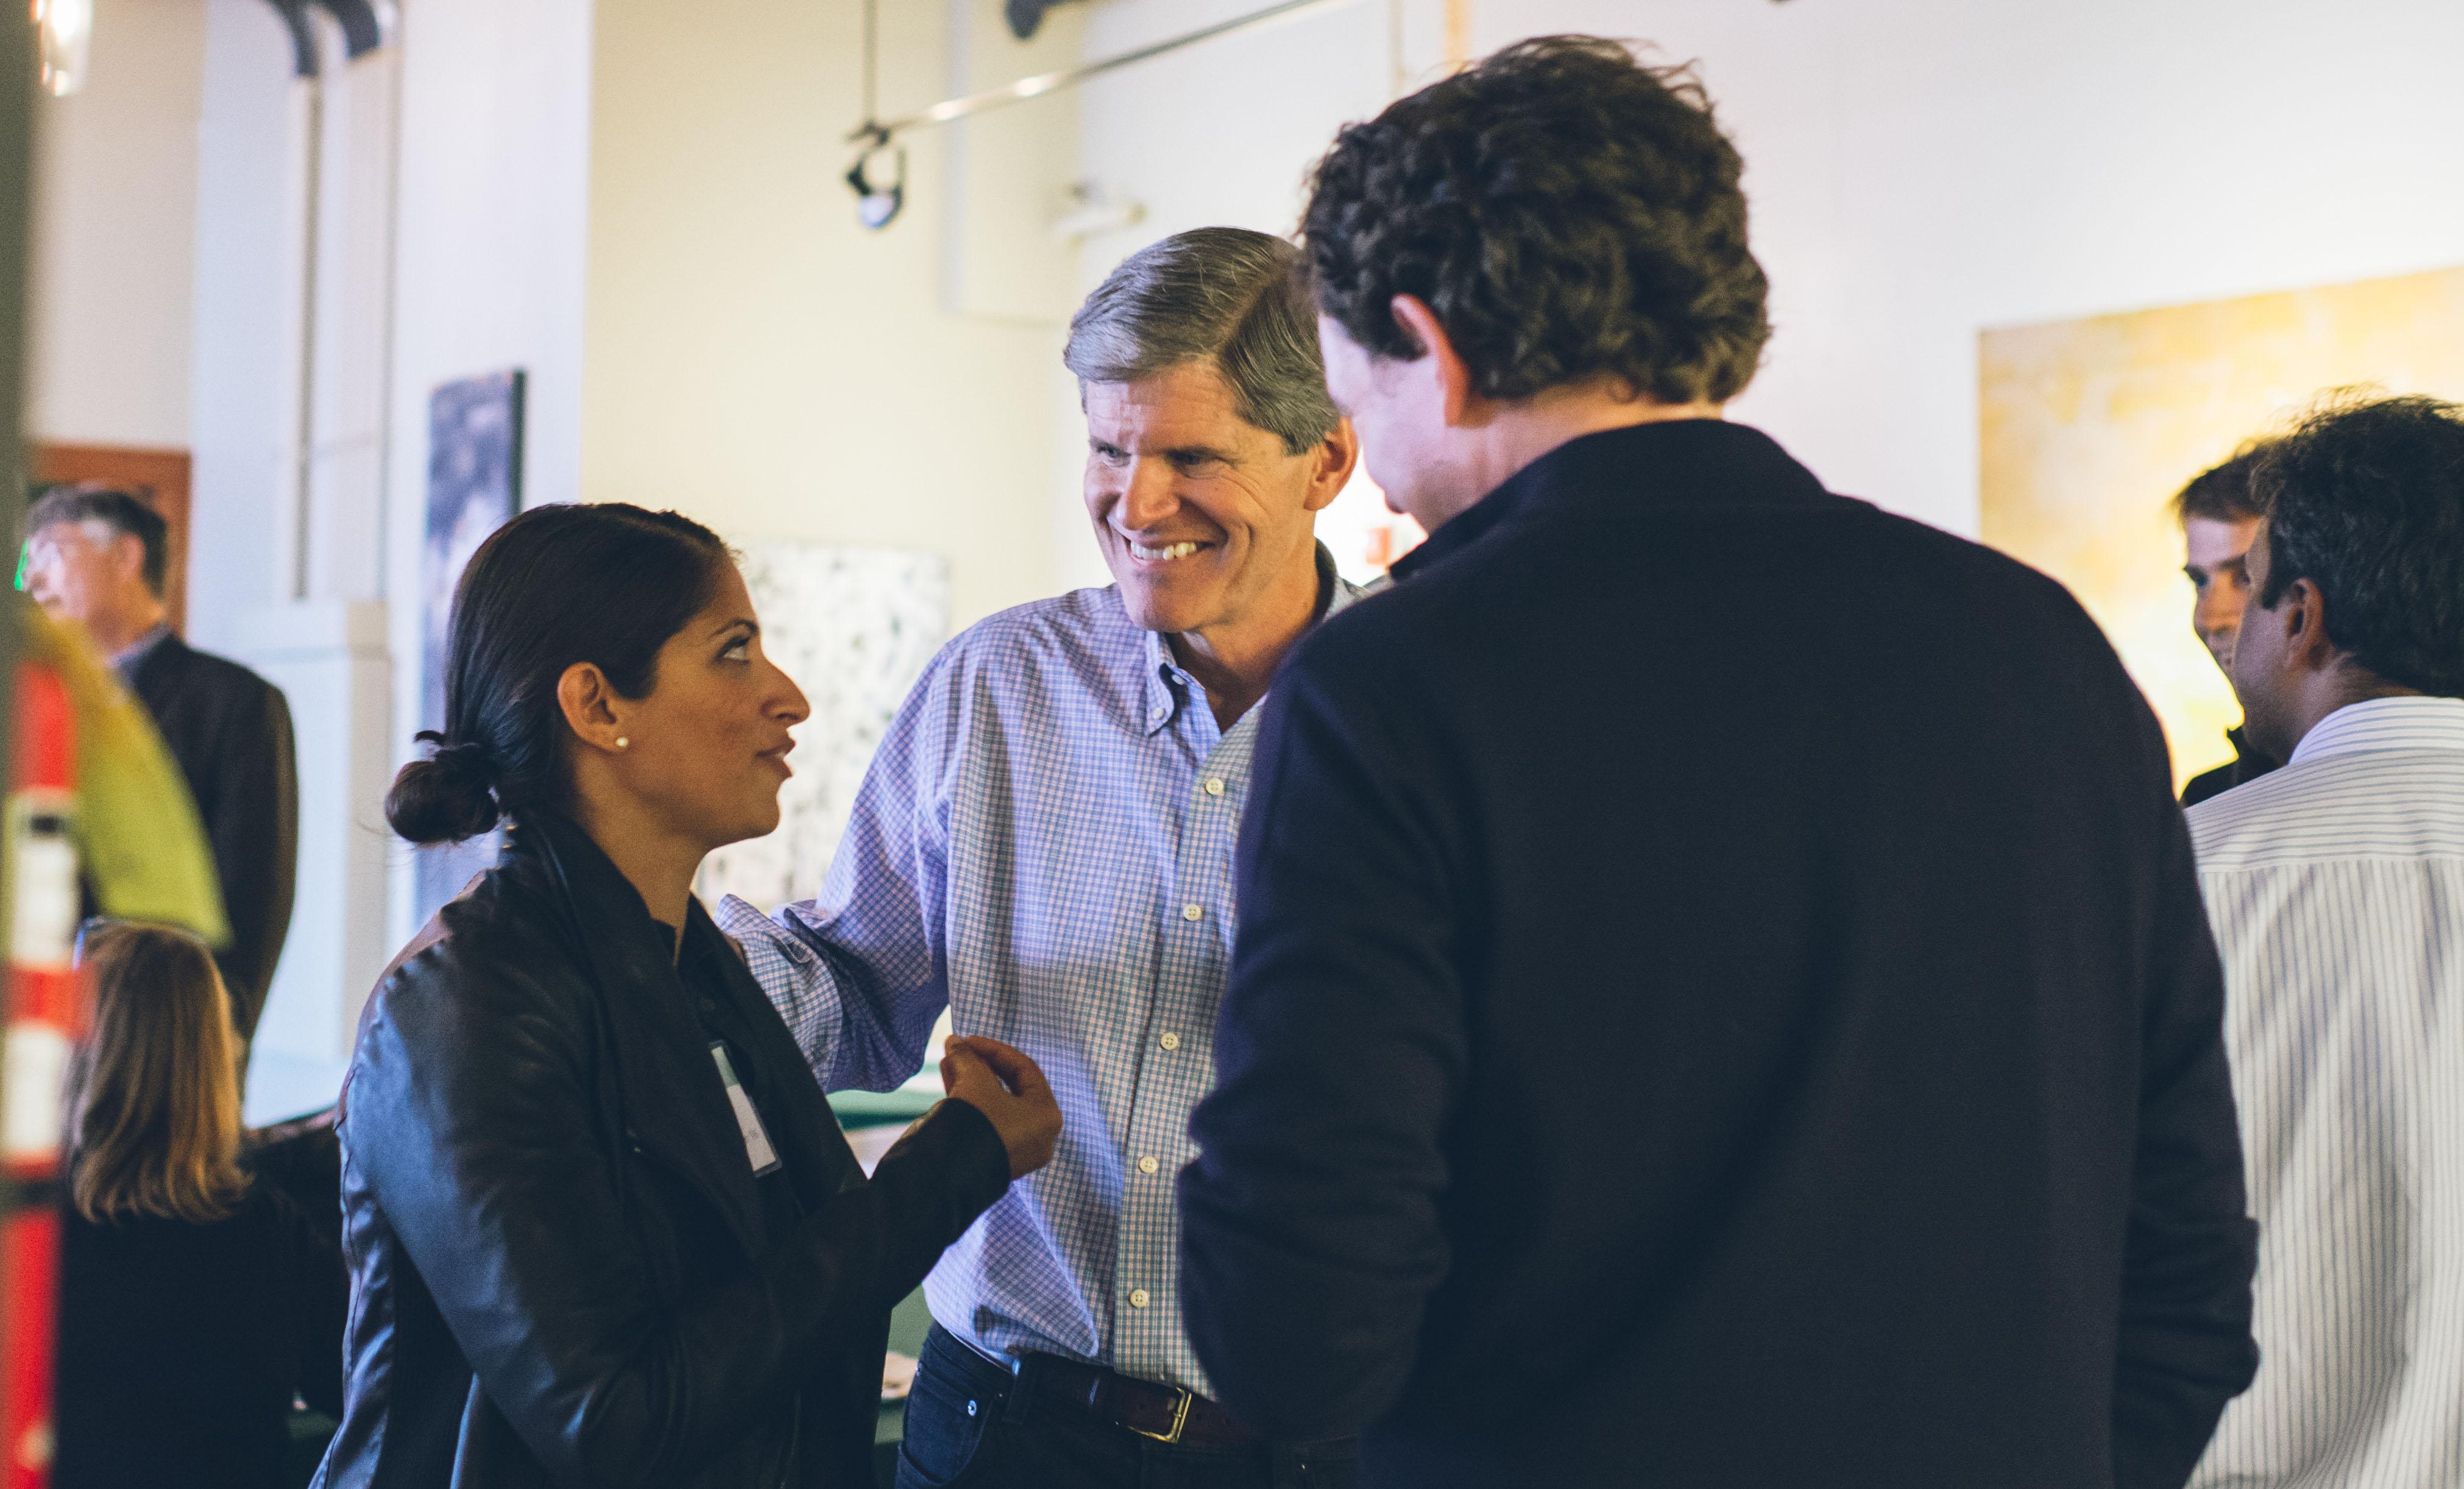 Alumni mingling at the Dartmouth Entrepreneurs Forum